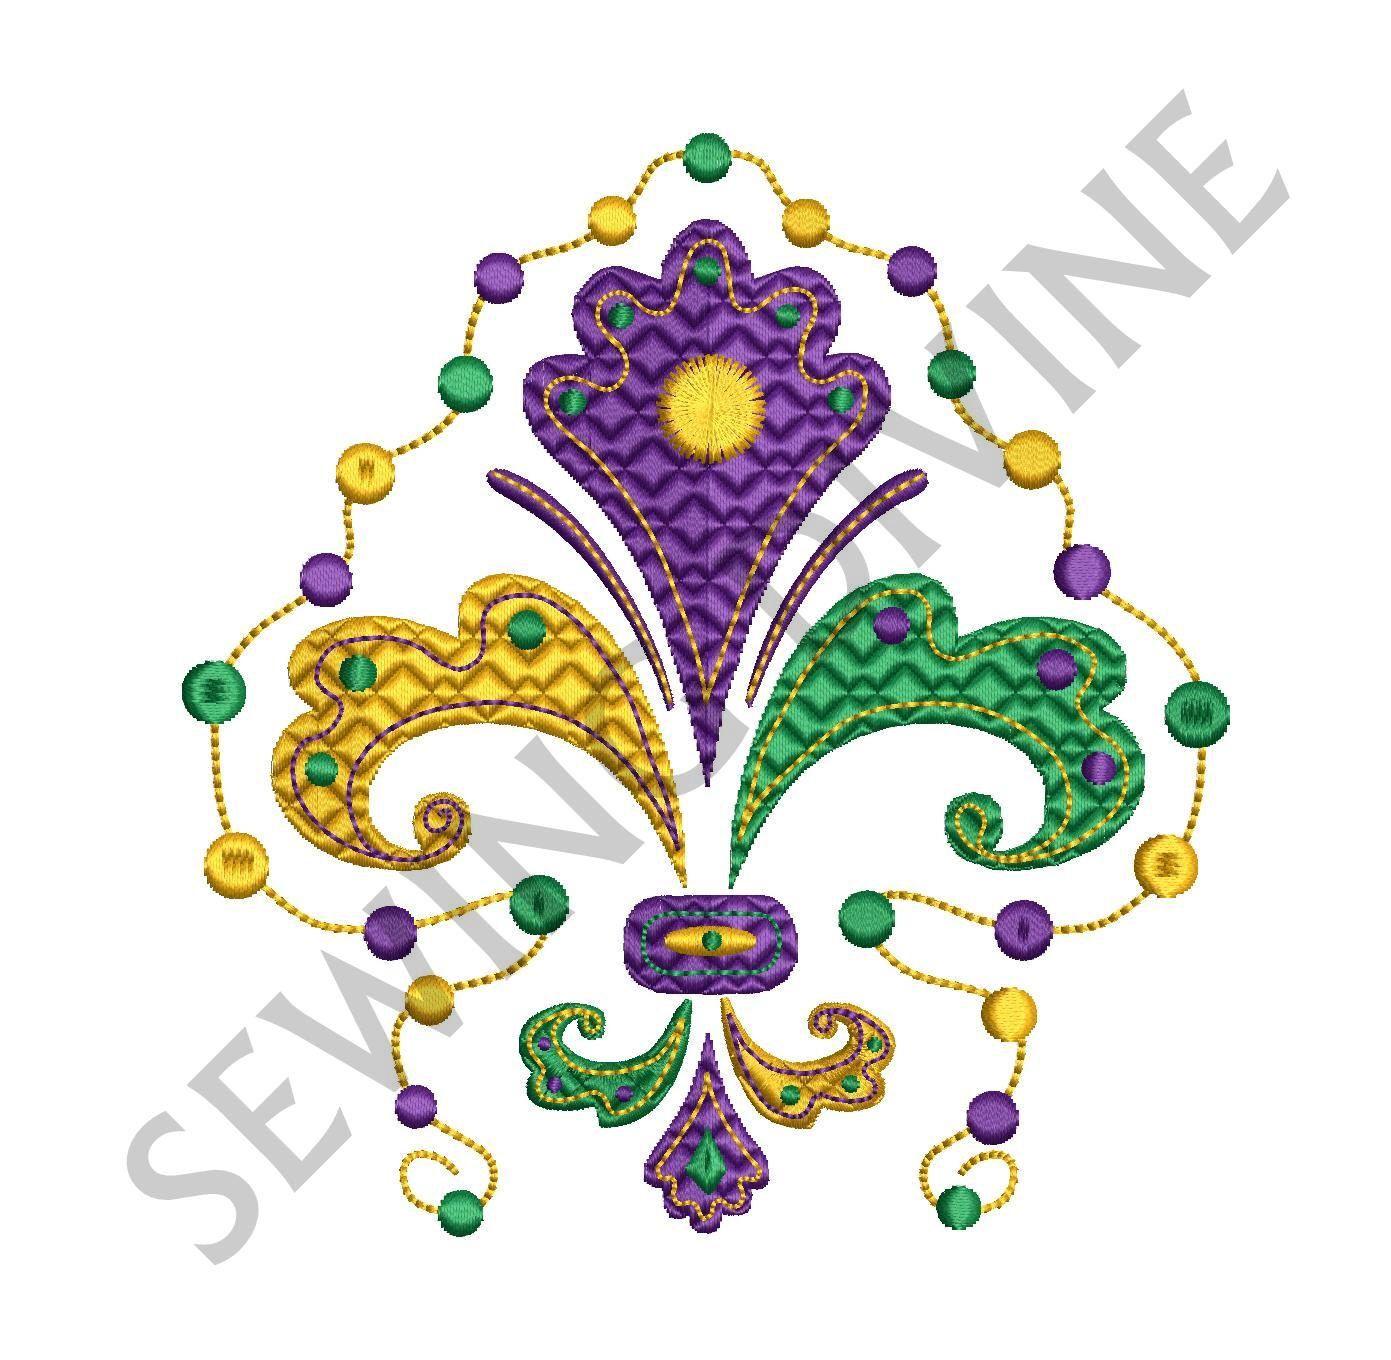 mardi gras fleur de lis beads embroidery design 3 sizes. Black Bedroom Furniture Sets. Home Design Ideas